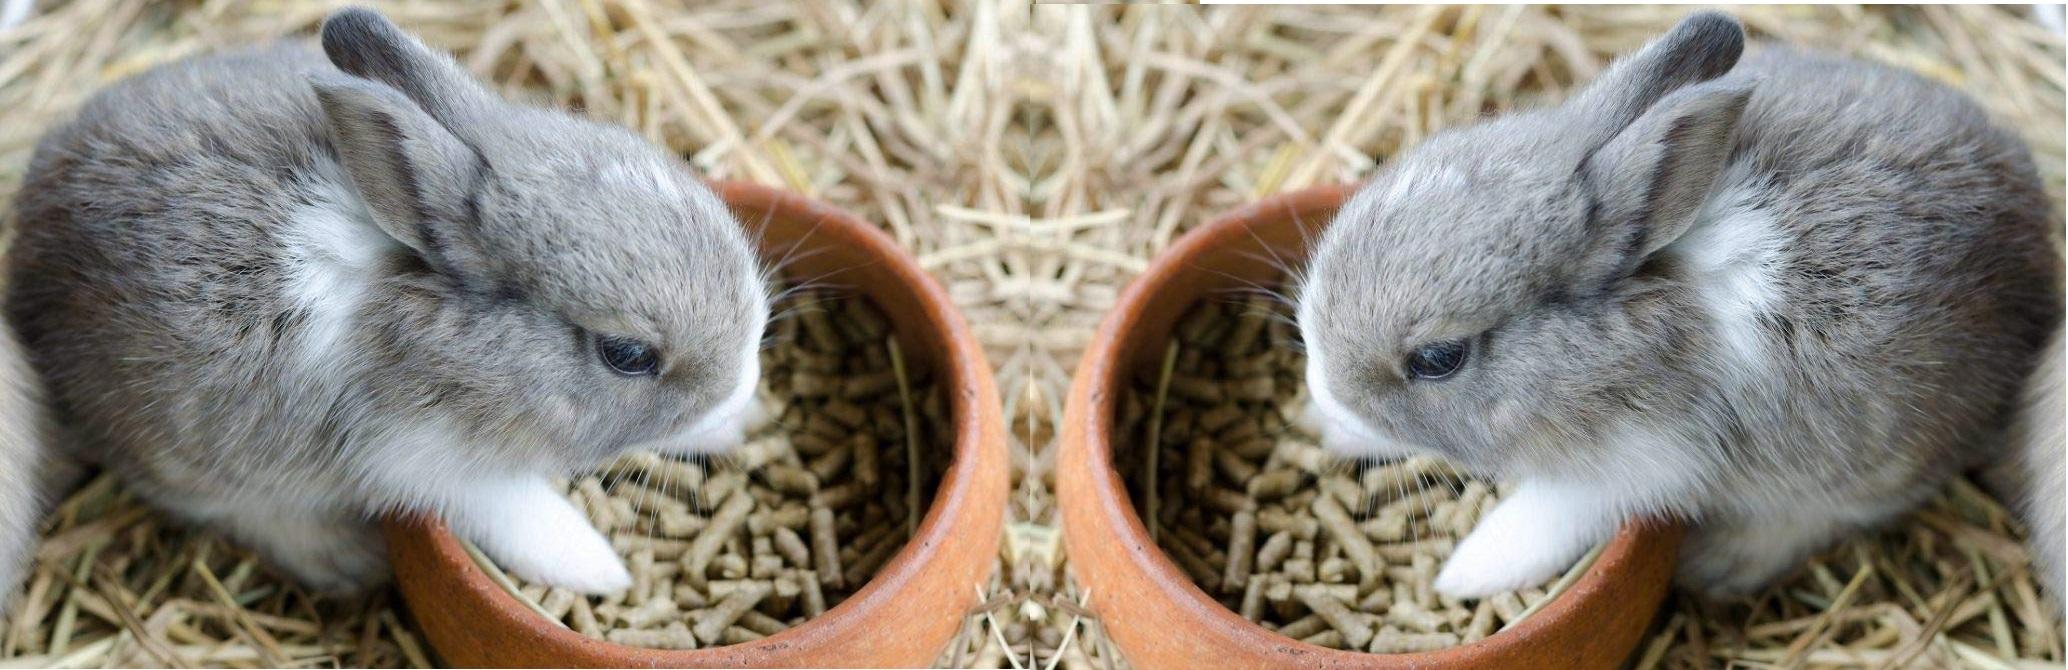 اهمیت غذا در سلامت خرگوش خانگی